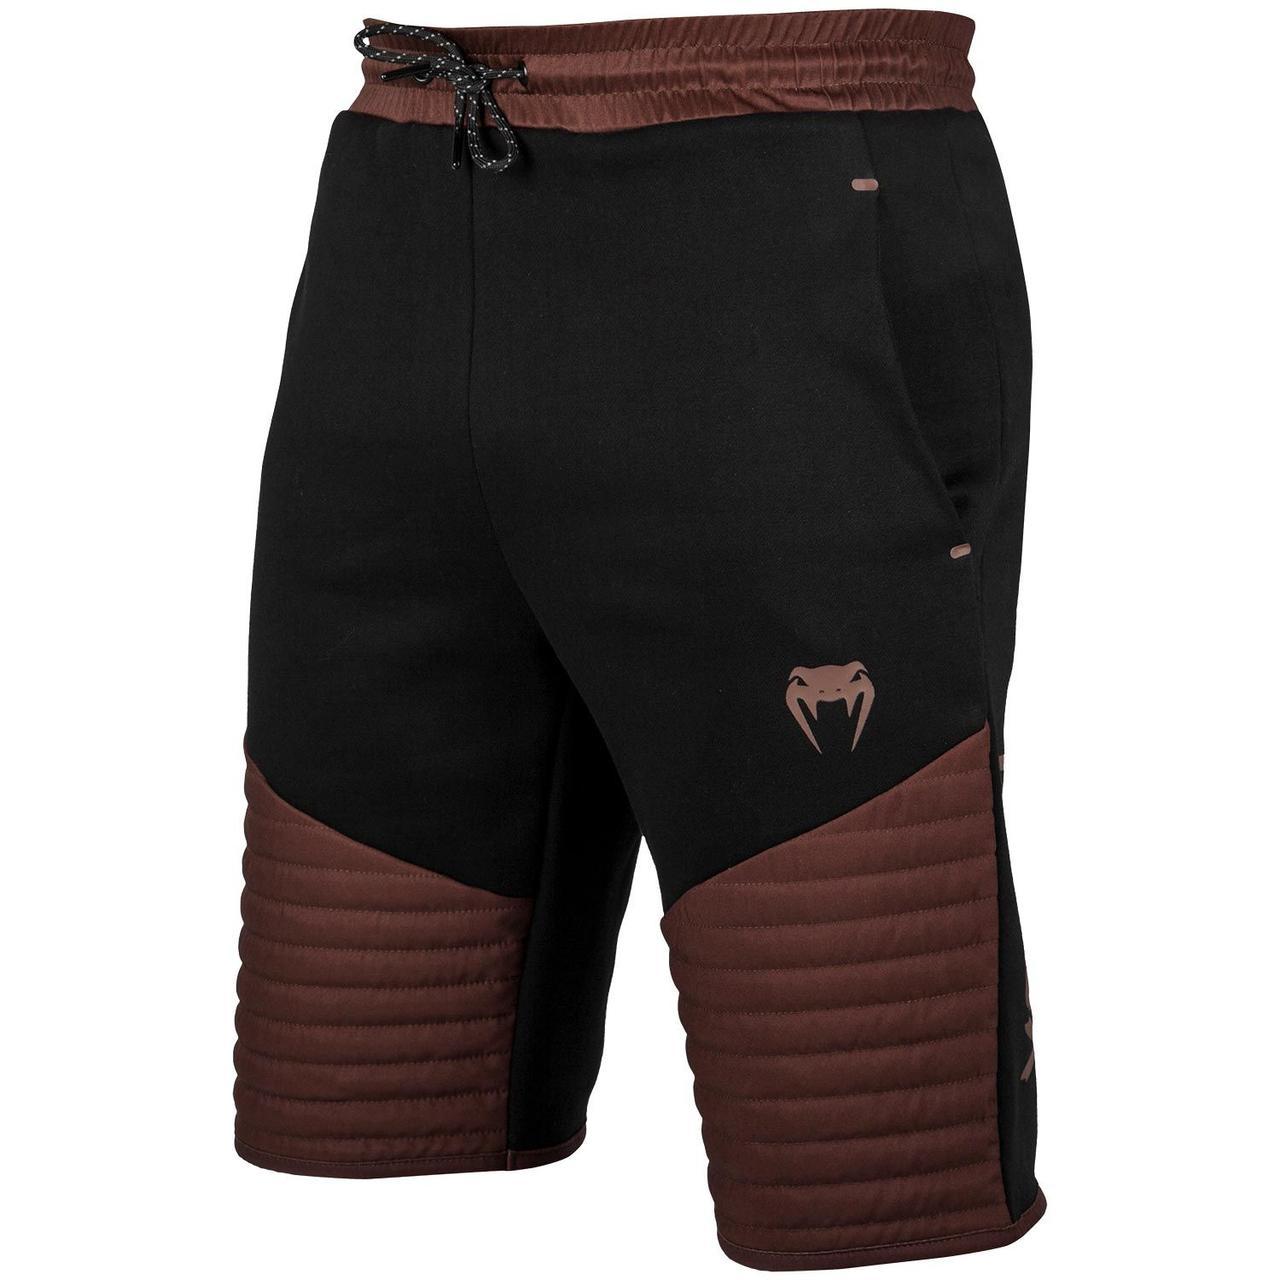 Шорты Venum Laser Classic Cotton Shorts Black Brown